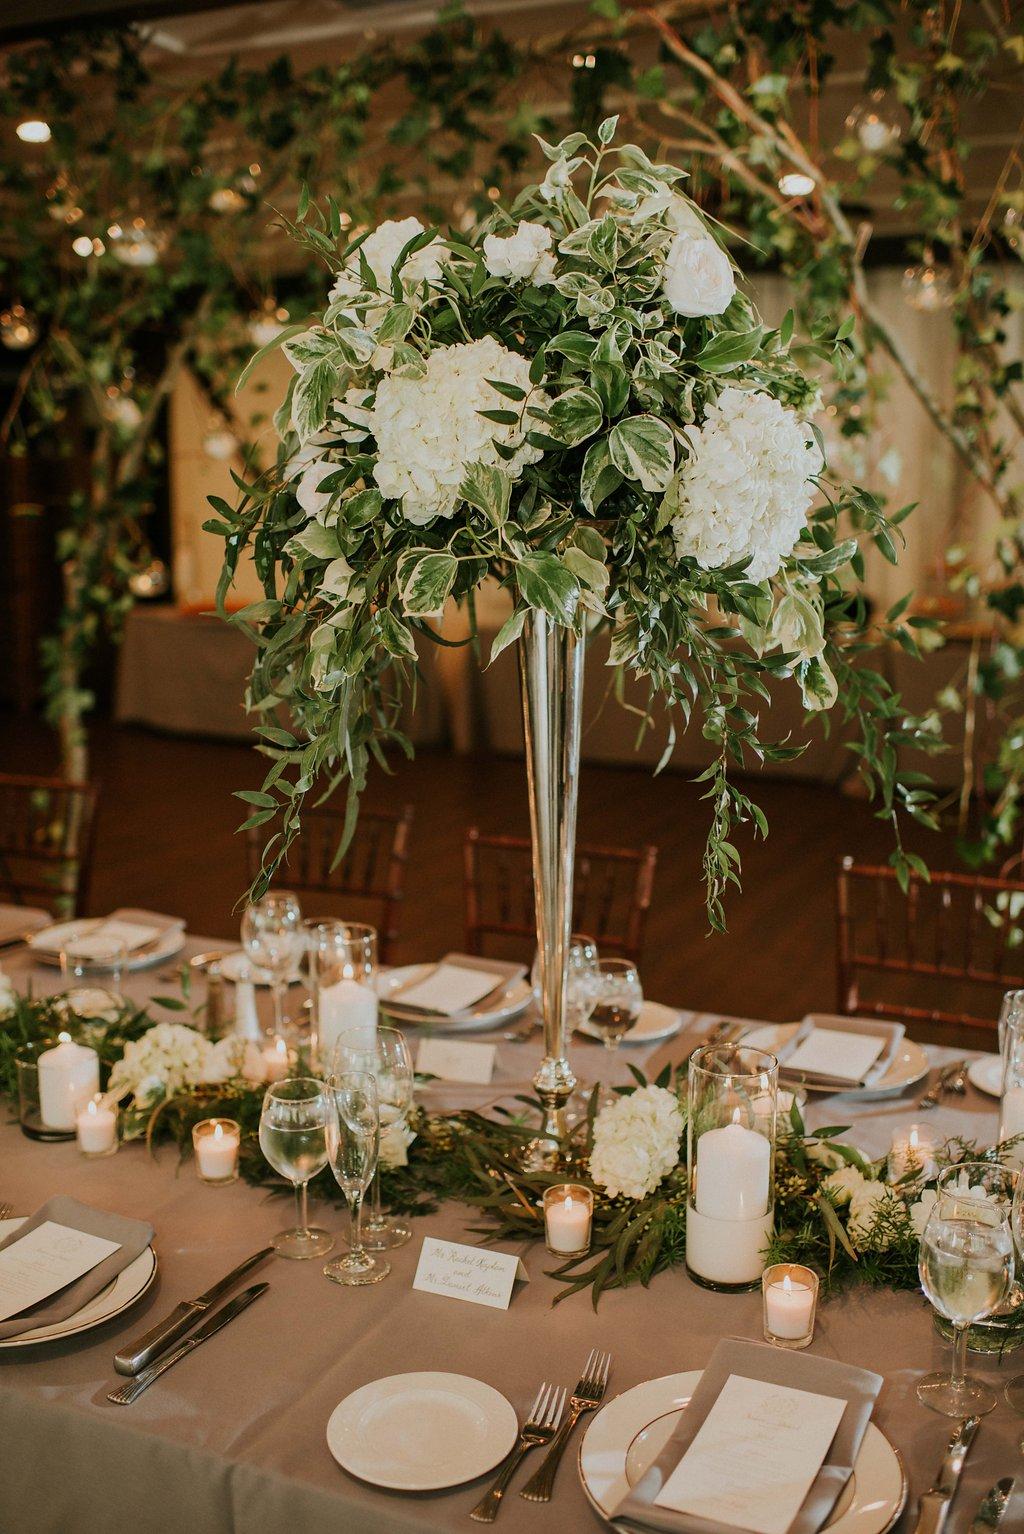 HillbrookClub_Wedding_Cleveland_Jessica+Dani_M+JPhoto-726.JPG